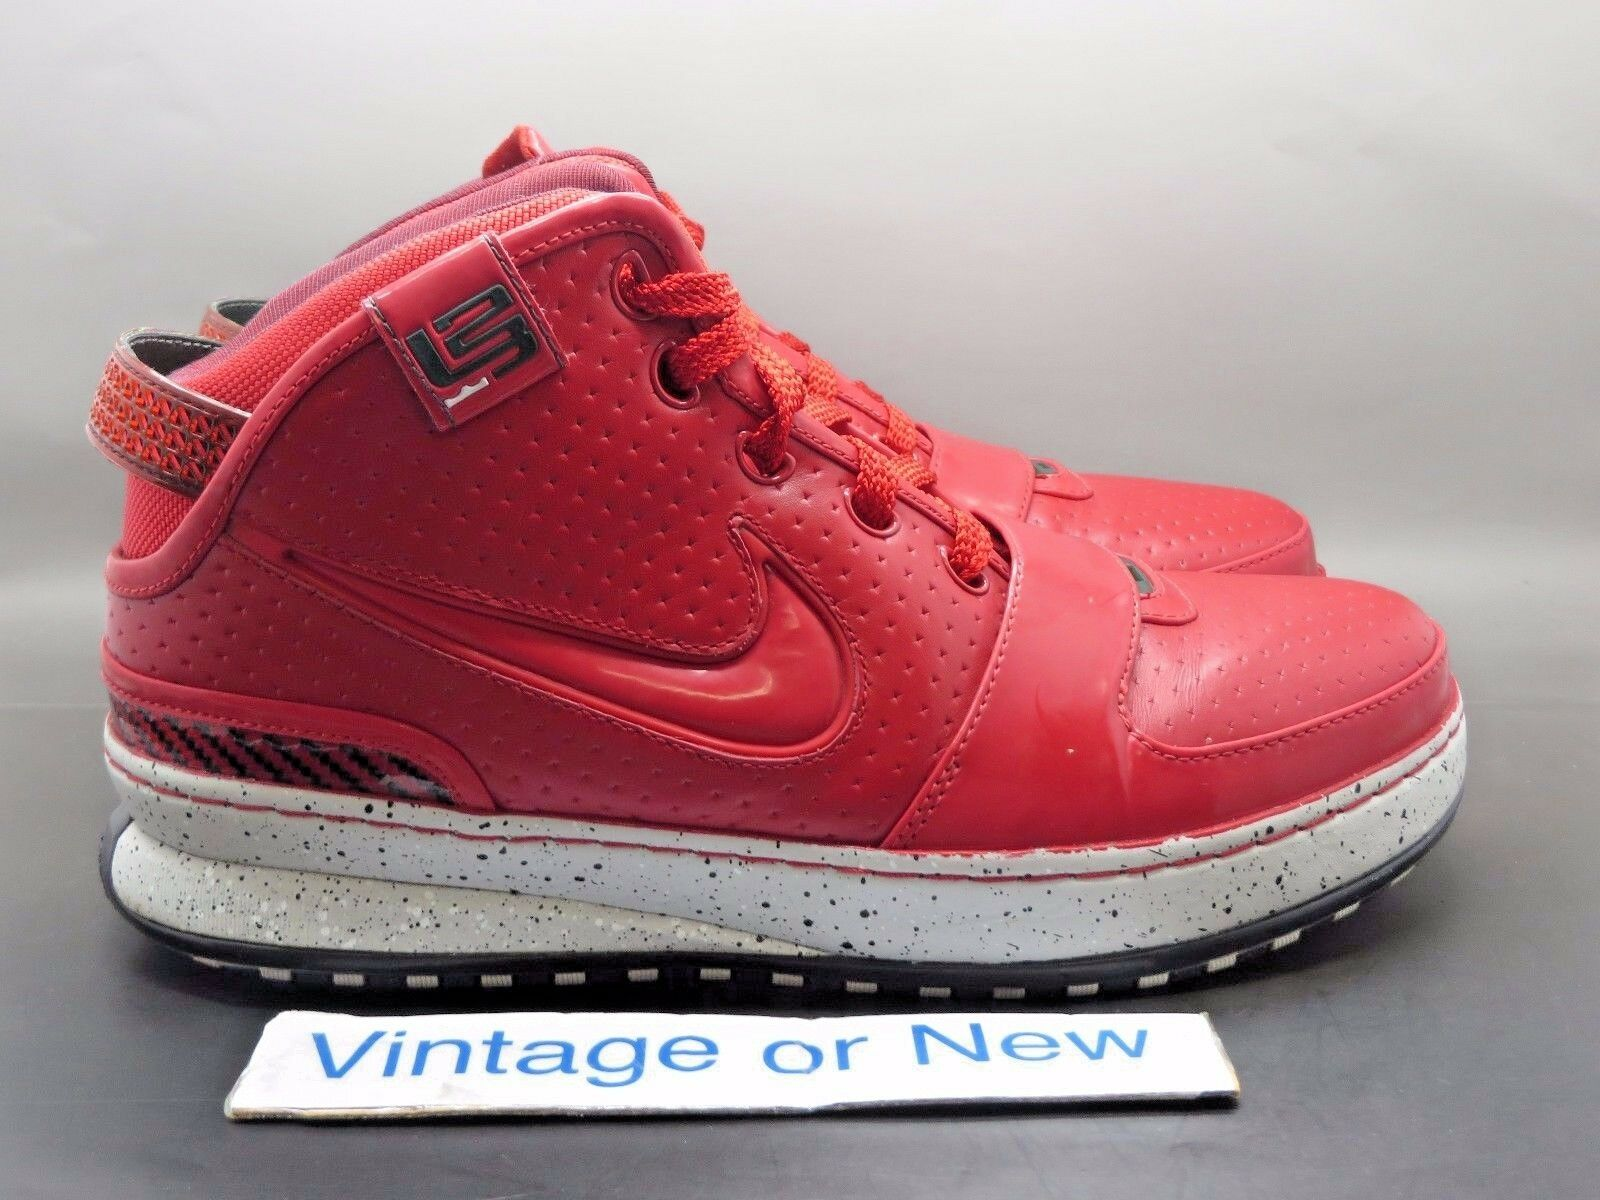 Nike Zoom LeBron VI 6 Big Apple 2009 sz 8